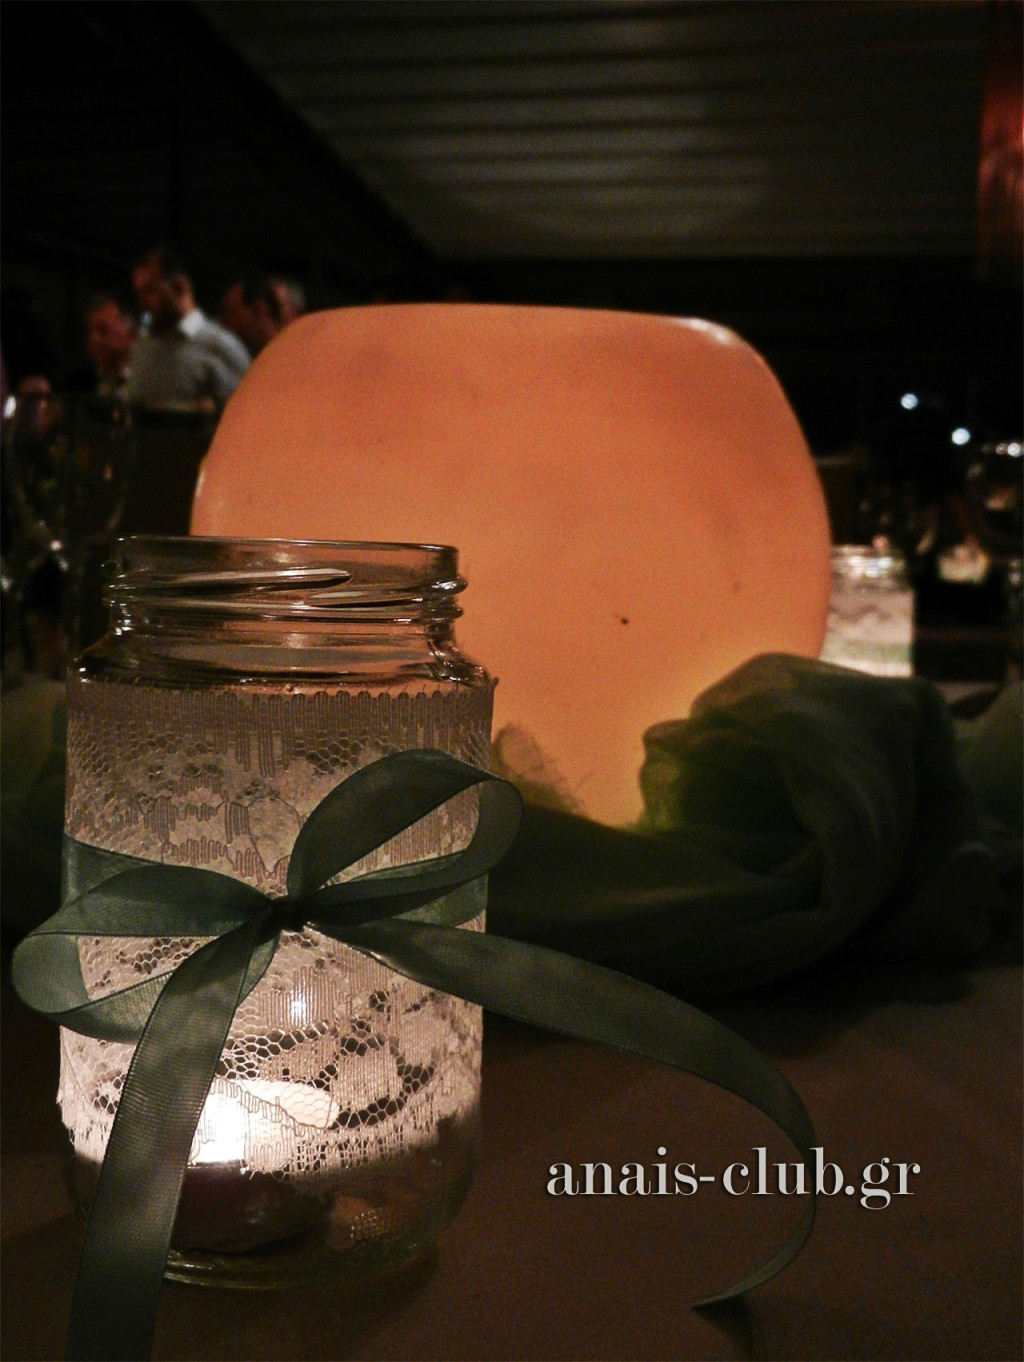 Centerpiece η κερόμπαλα πάνω σε ύφασμα στο χρώμα της μέντας και βαζάκια ντυμένα με ρομαντική λευκή δαντέλα και κορδελίτσα στο ίδιο χρώμα της μέντας